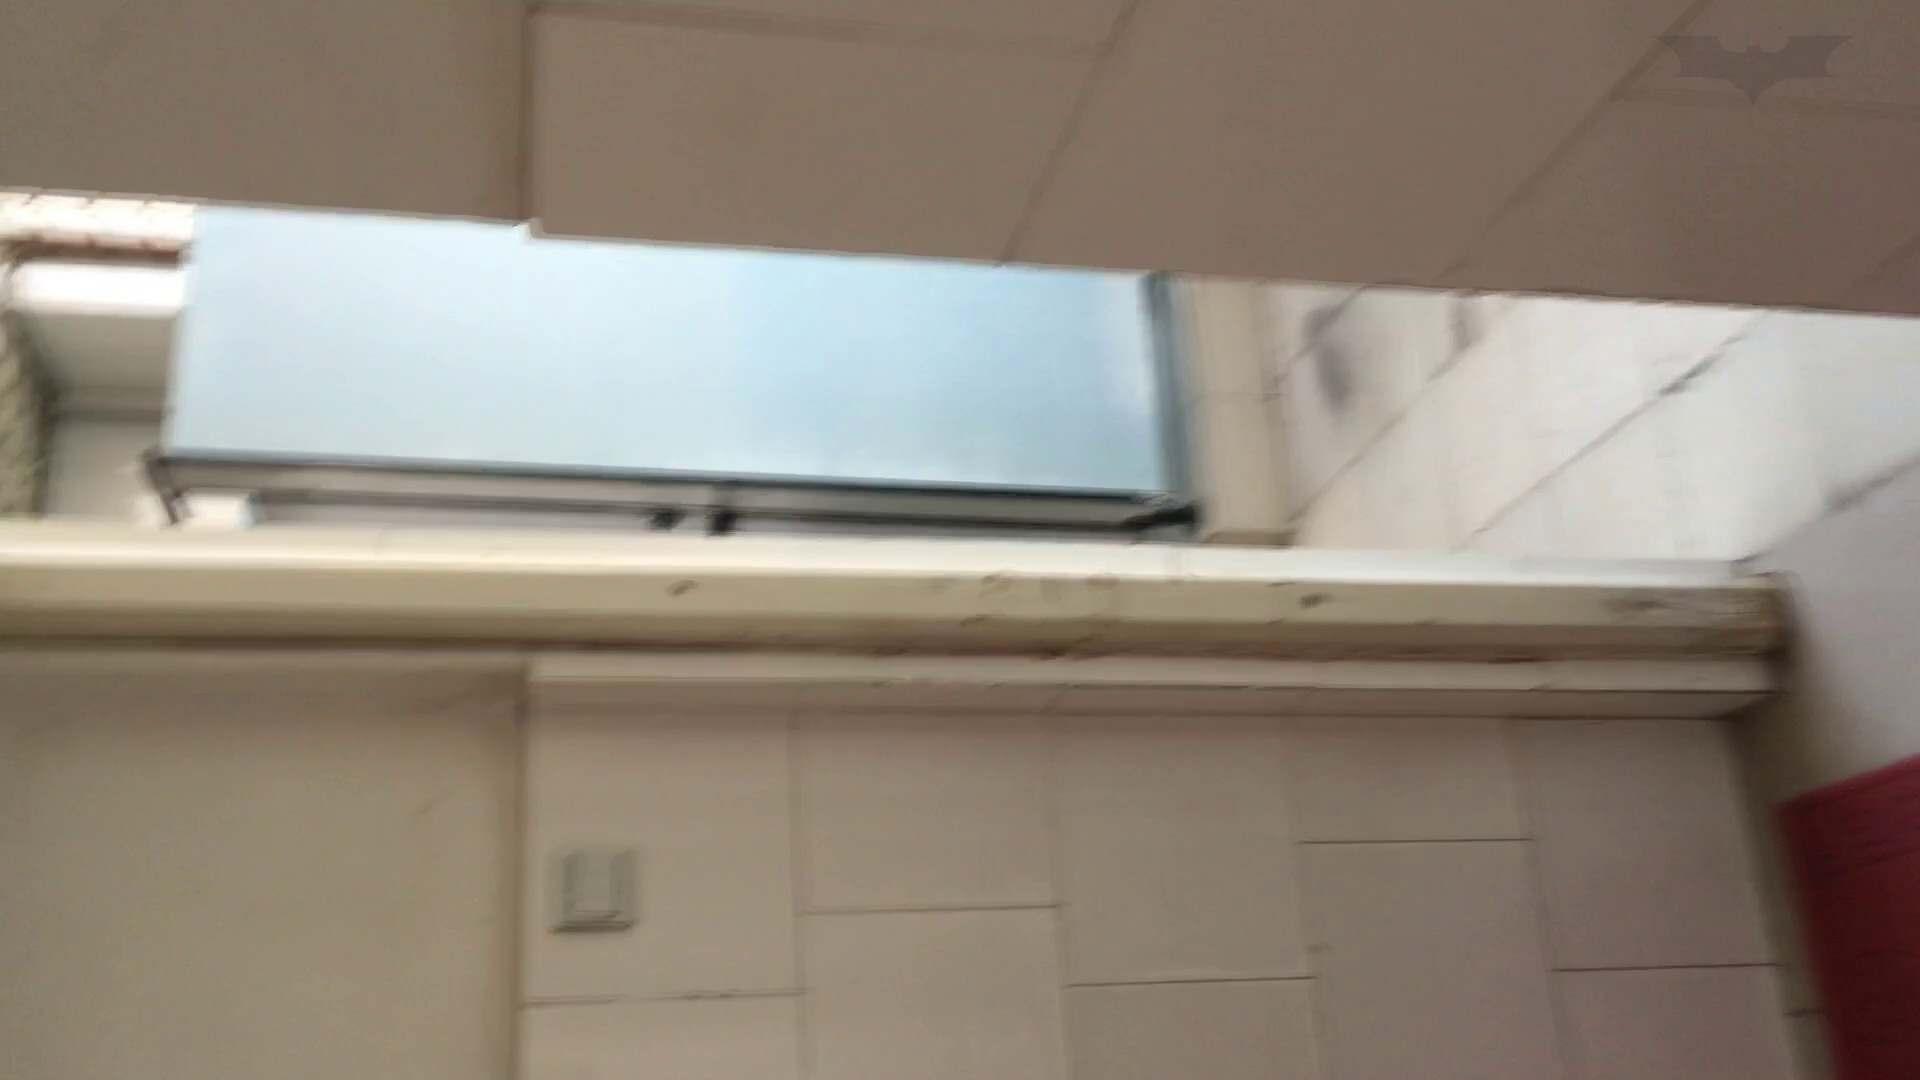 芸術大学ガチ潜入盗撮 JD盗撮 美女の洗面所の秘密 Vol.81 美肌 エロ画像 100枚 41